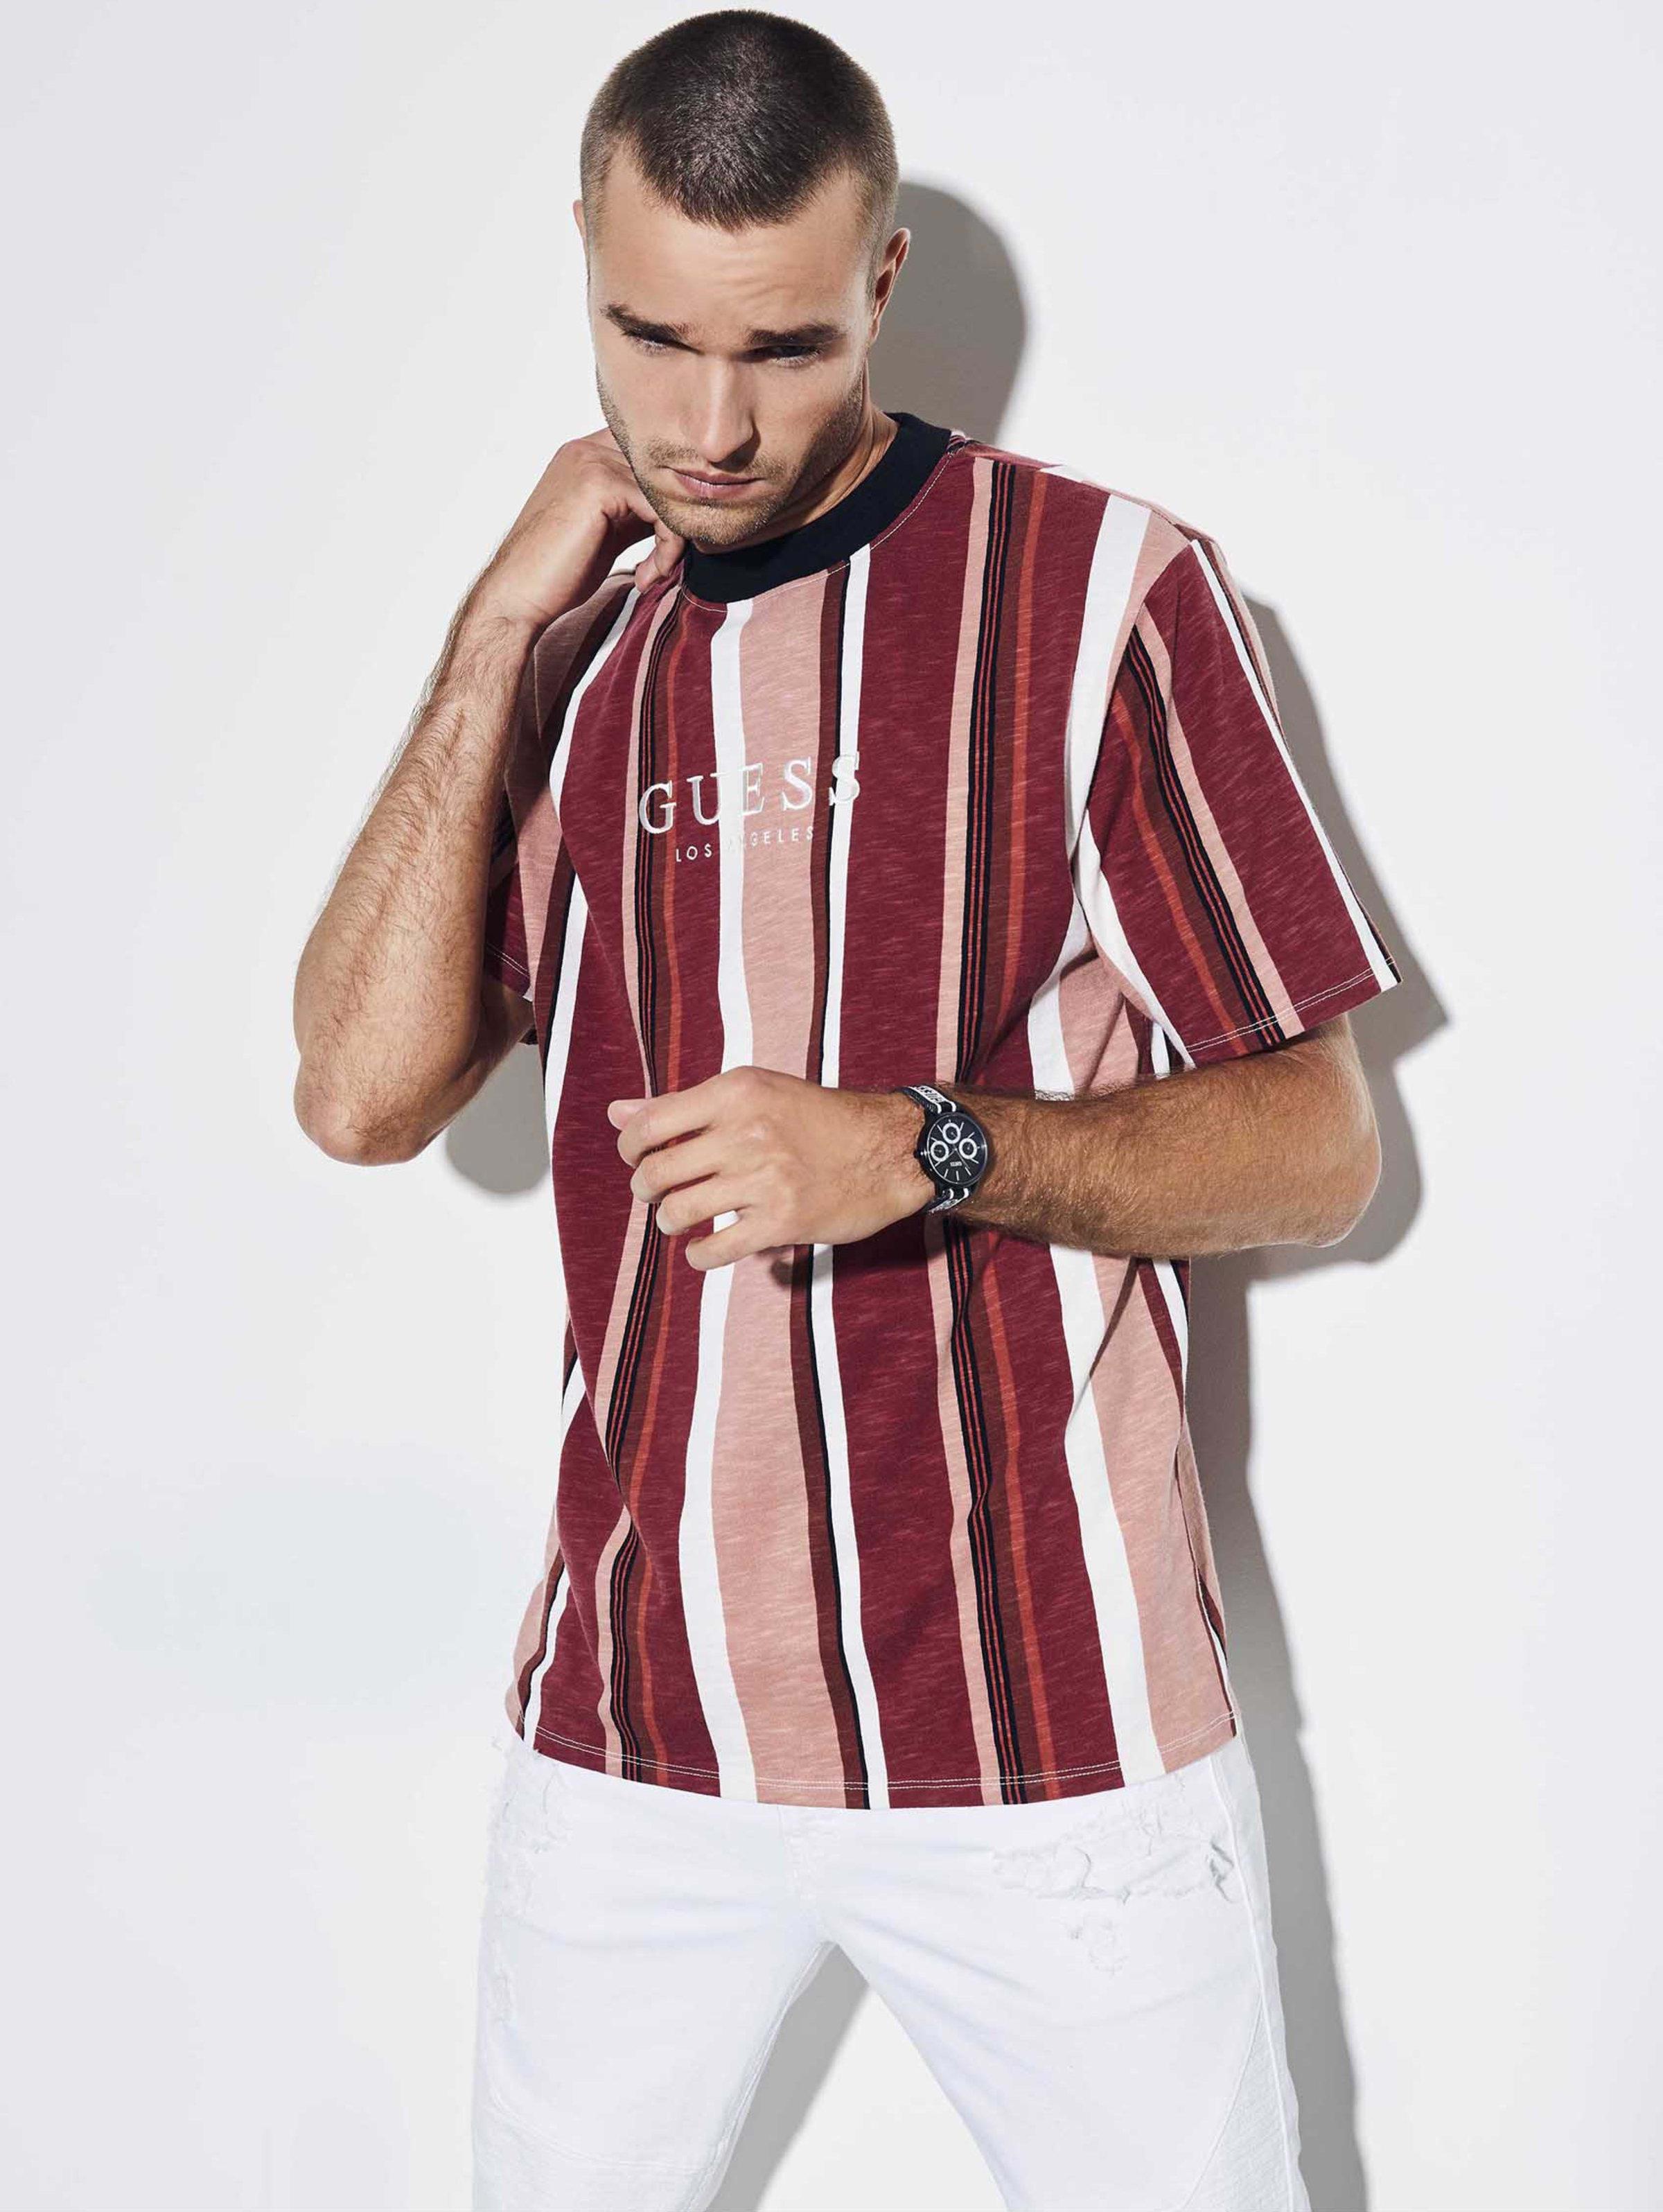 Originals Oversized Sayer Striped Tee | Striped tee, Mens